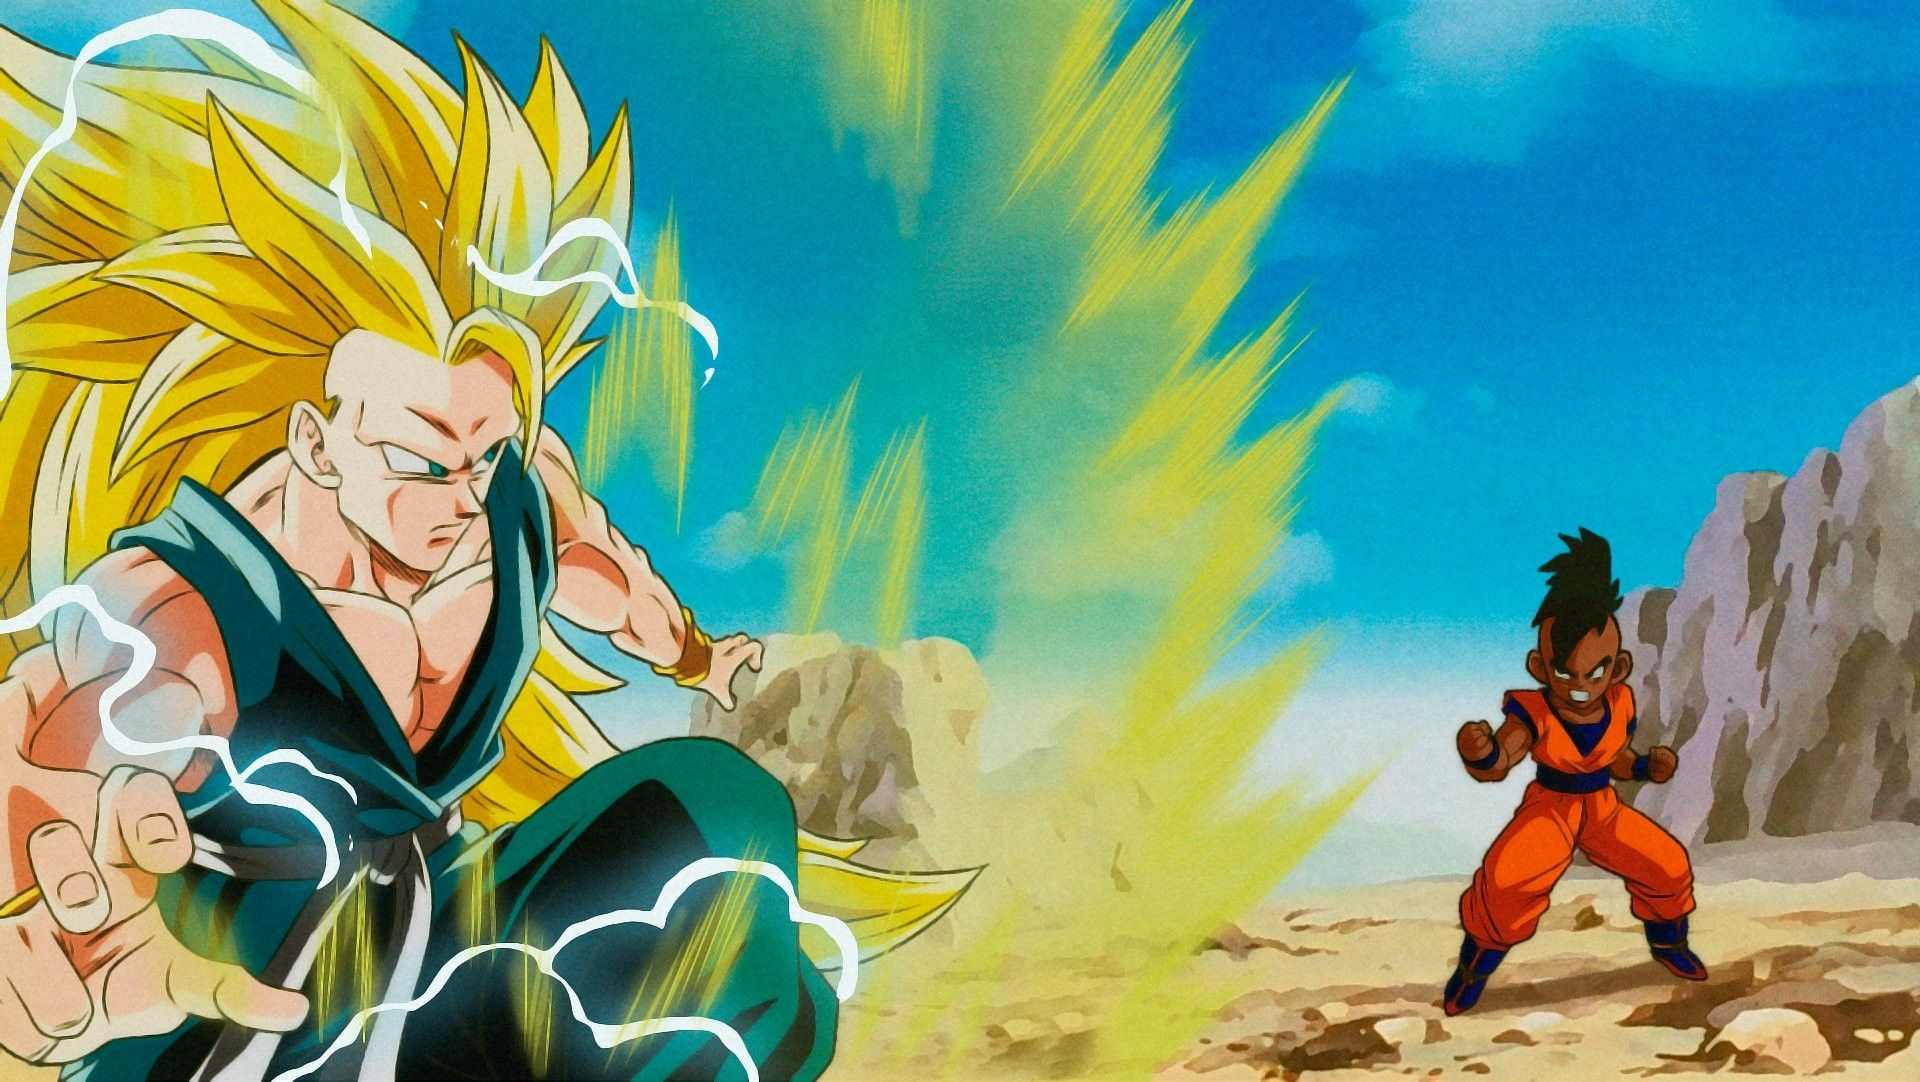 Super Saiyan 3 Goku Vs Uub Goku Ssj 3 Goku Vs Dragon Ball Z